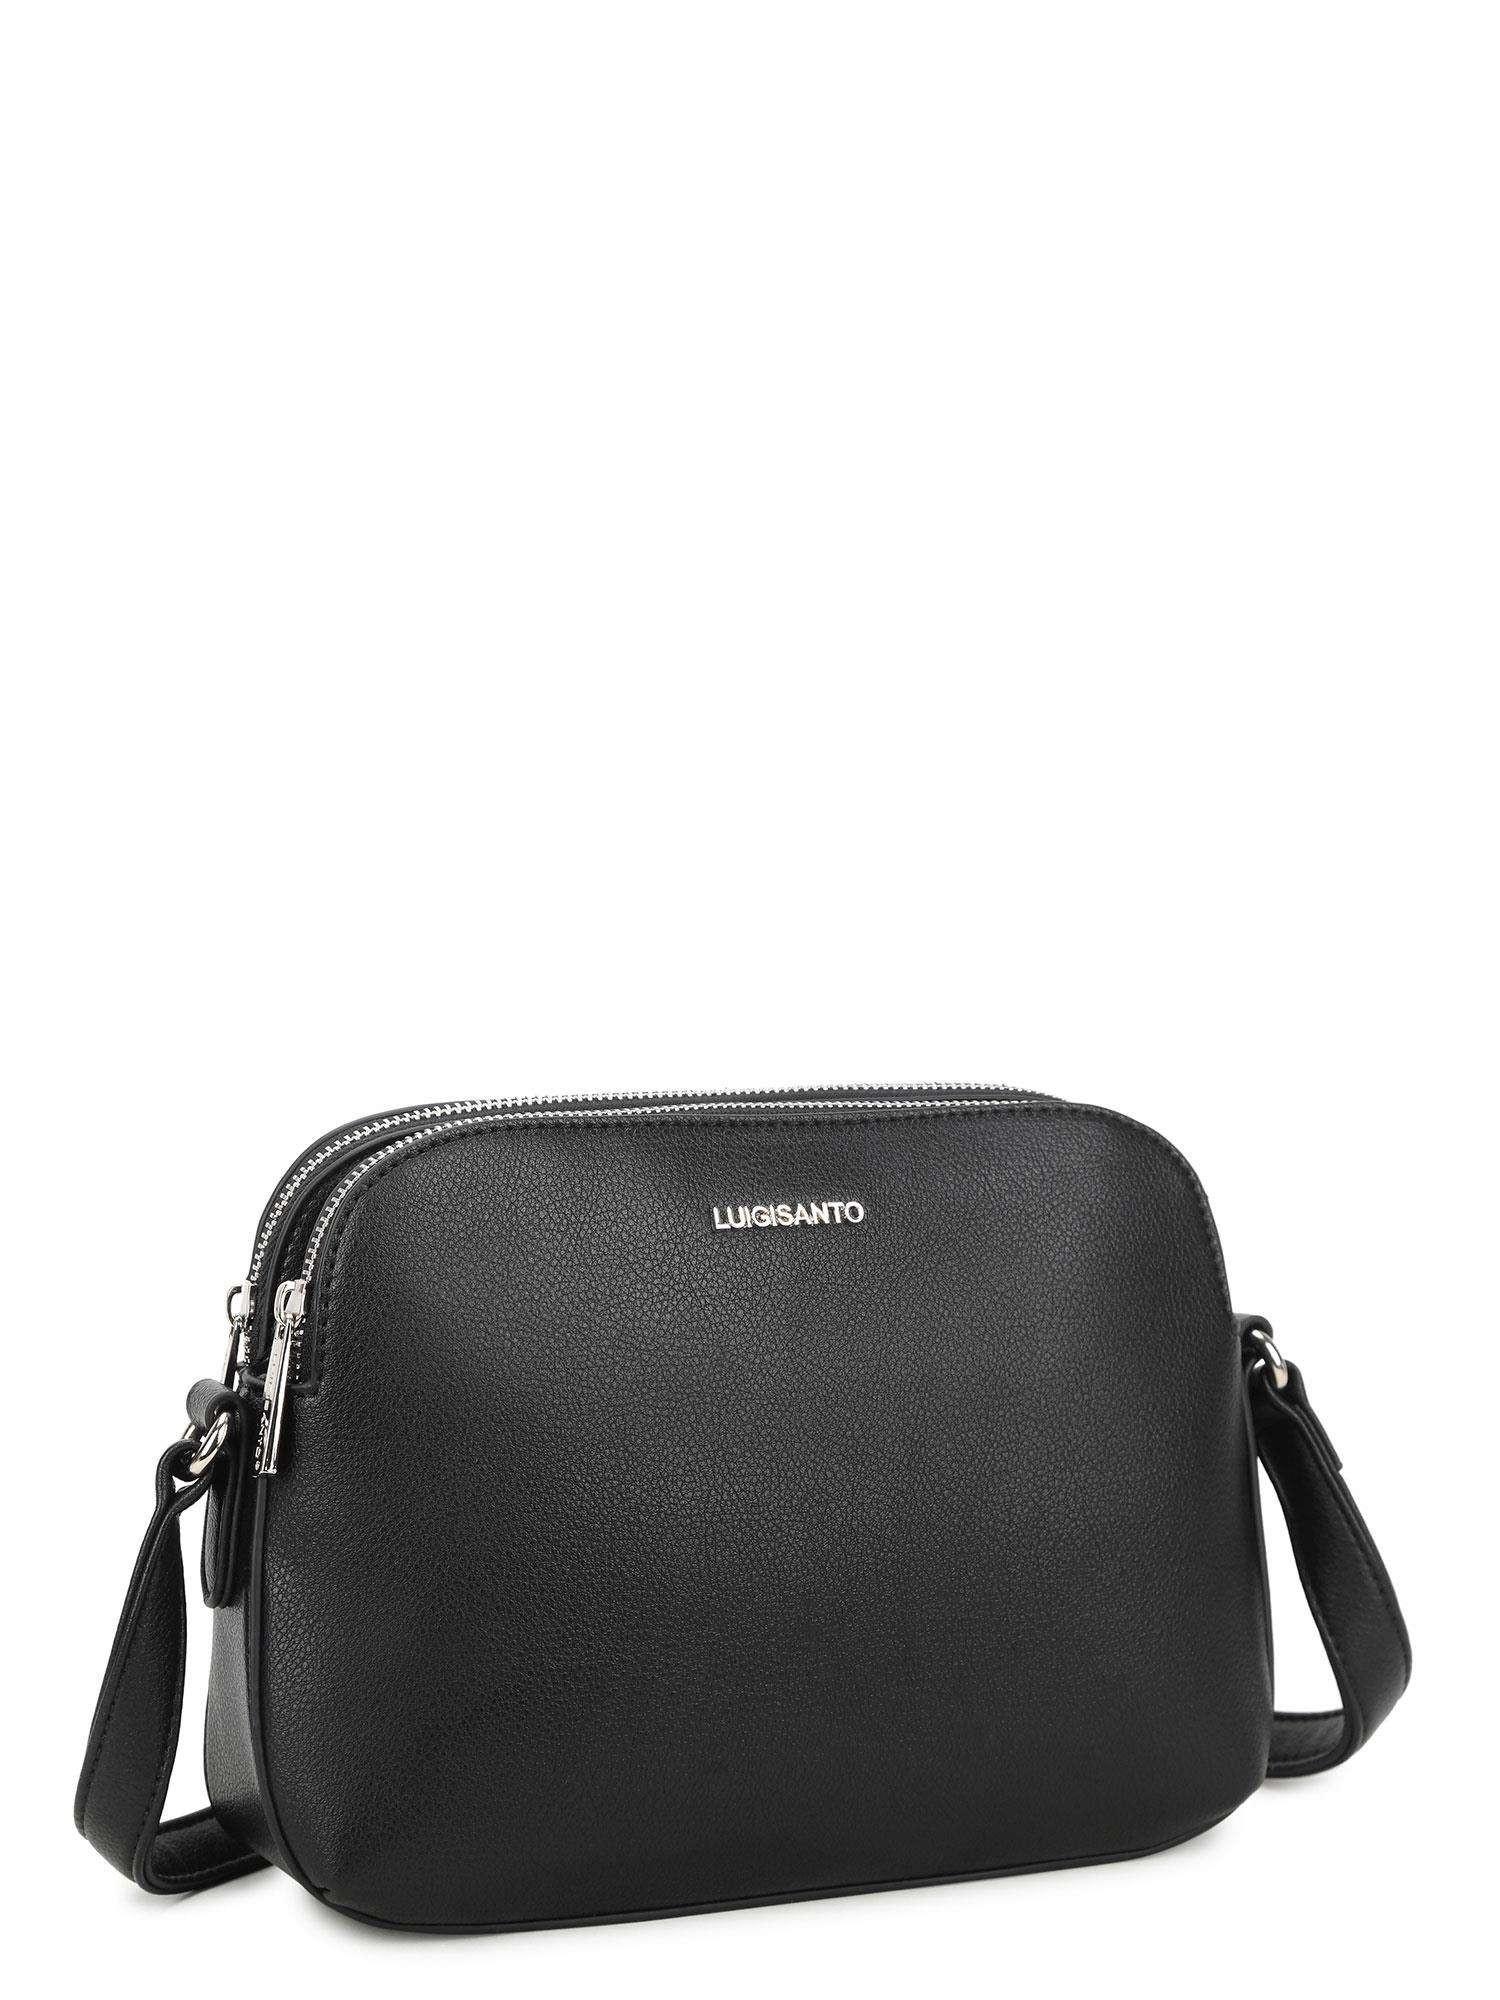 Dámska čierna kabelka LUIGISANTO ONE SIZE